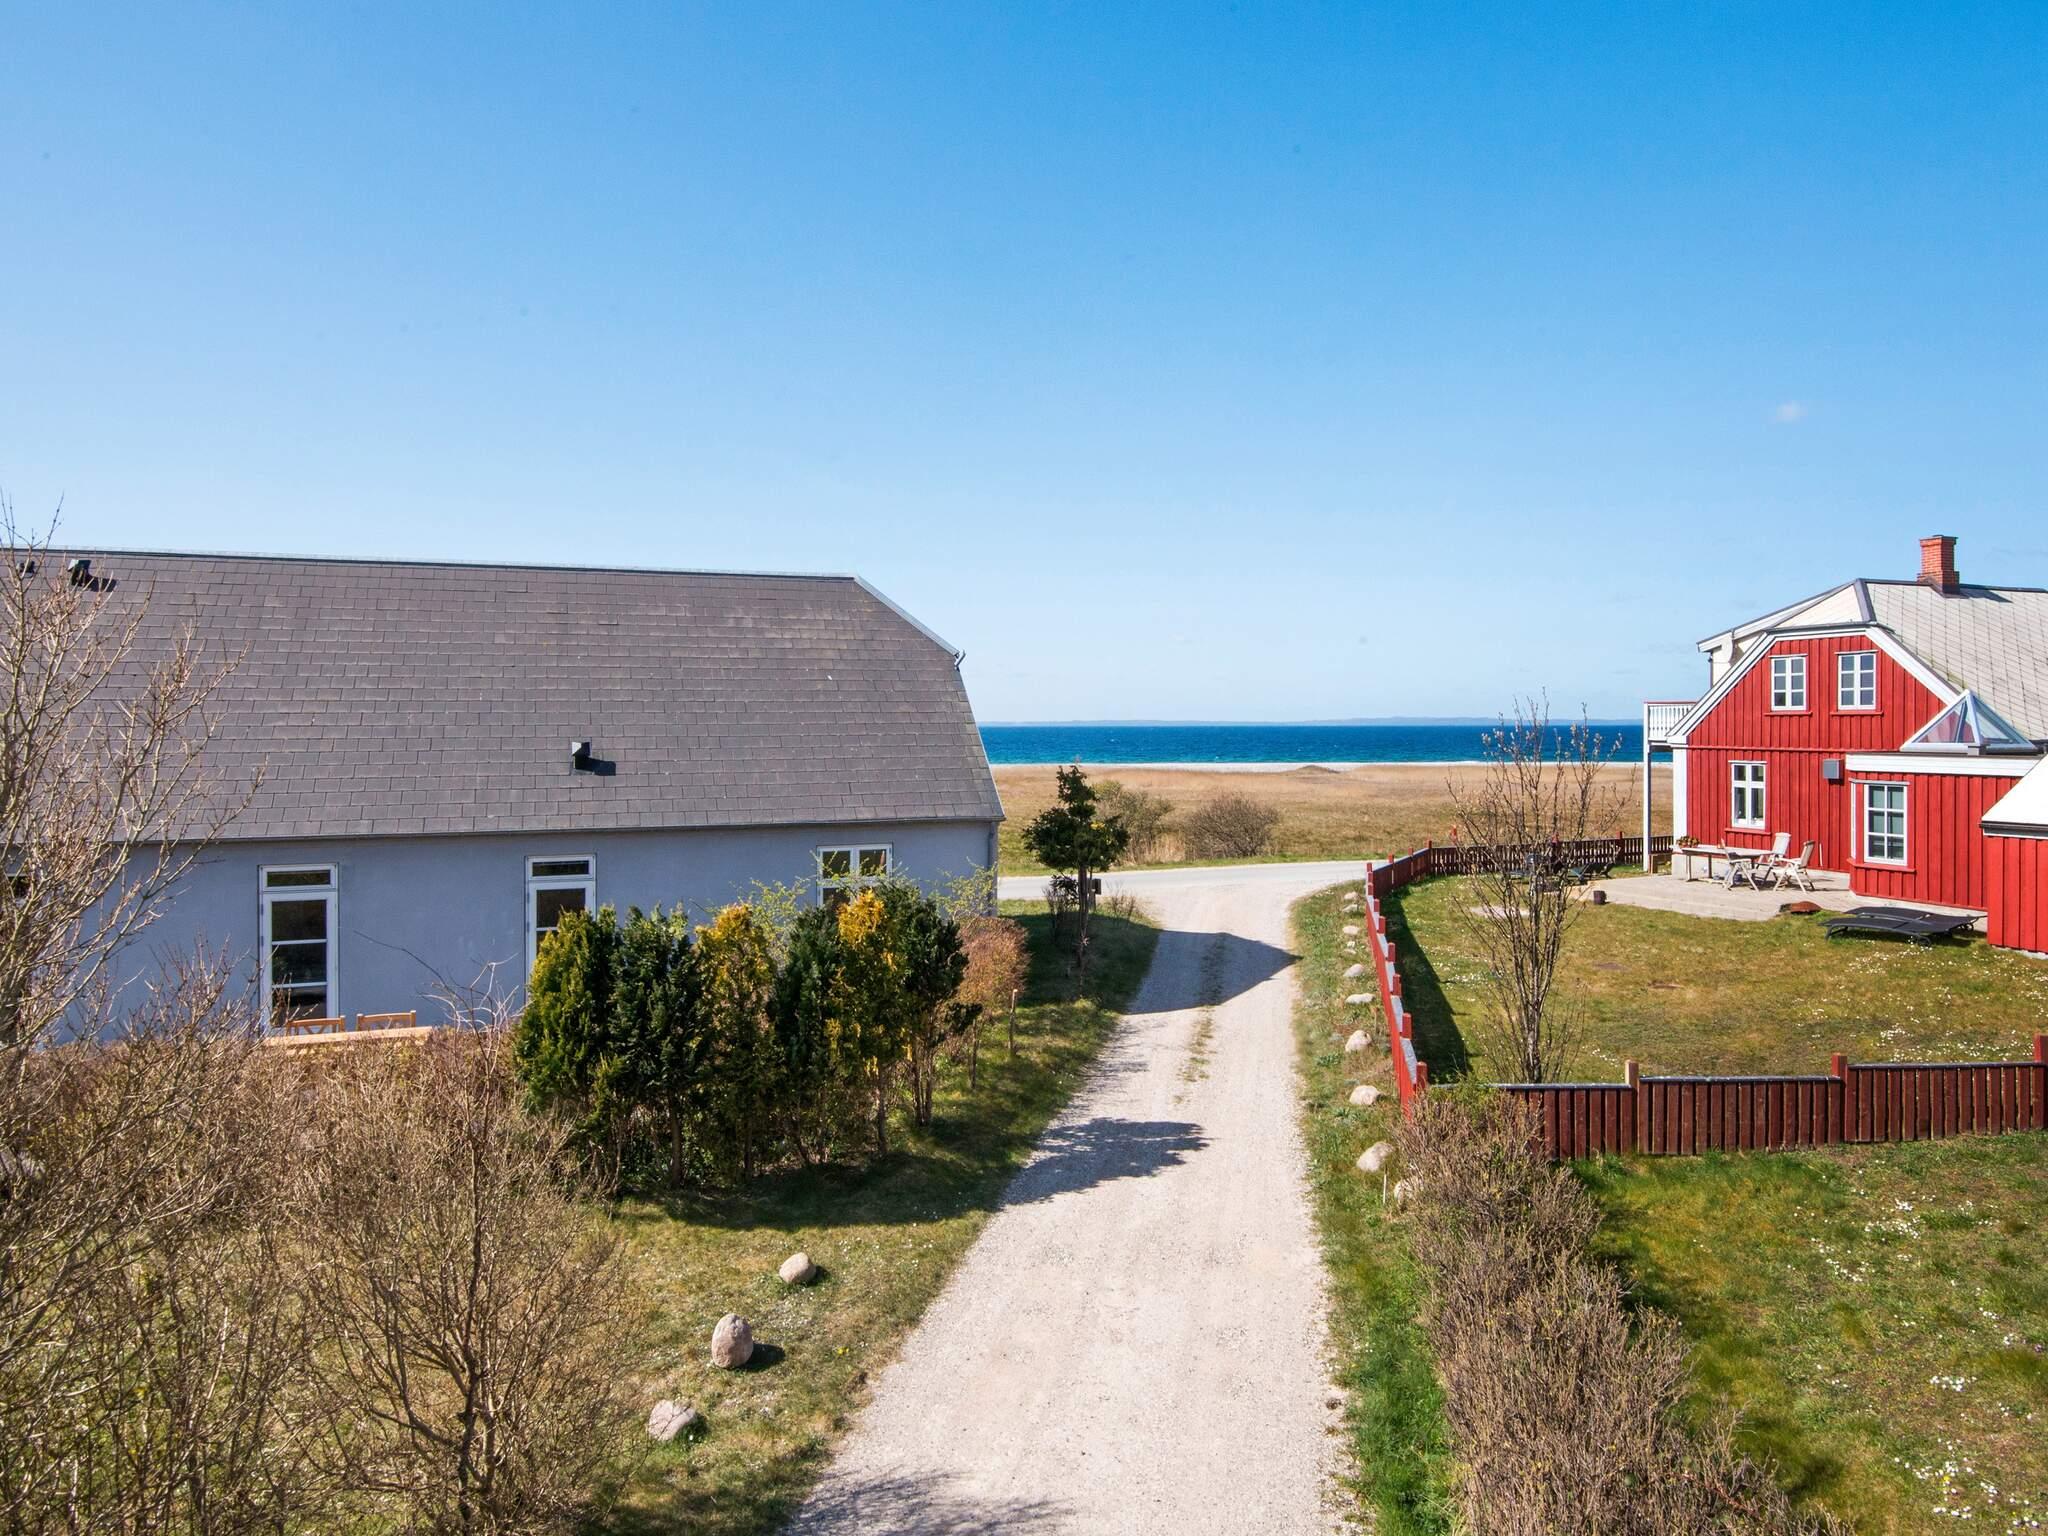 Maison de vacances Helgenæs (590964), Knebel, , Mer Baltique danoise, Danemark, image 25